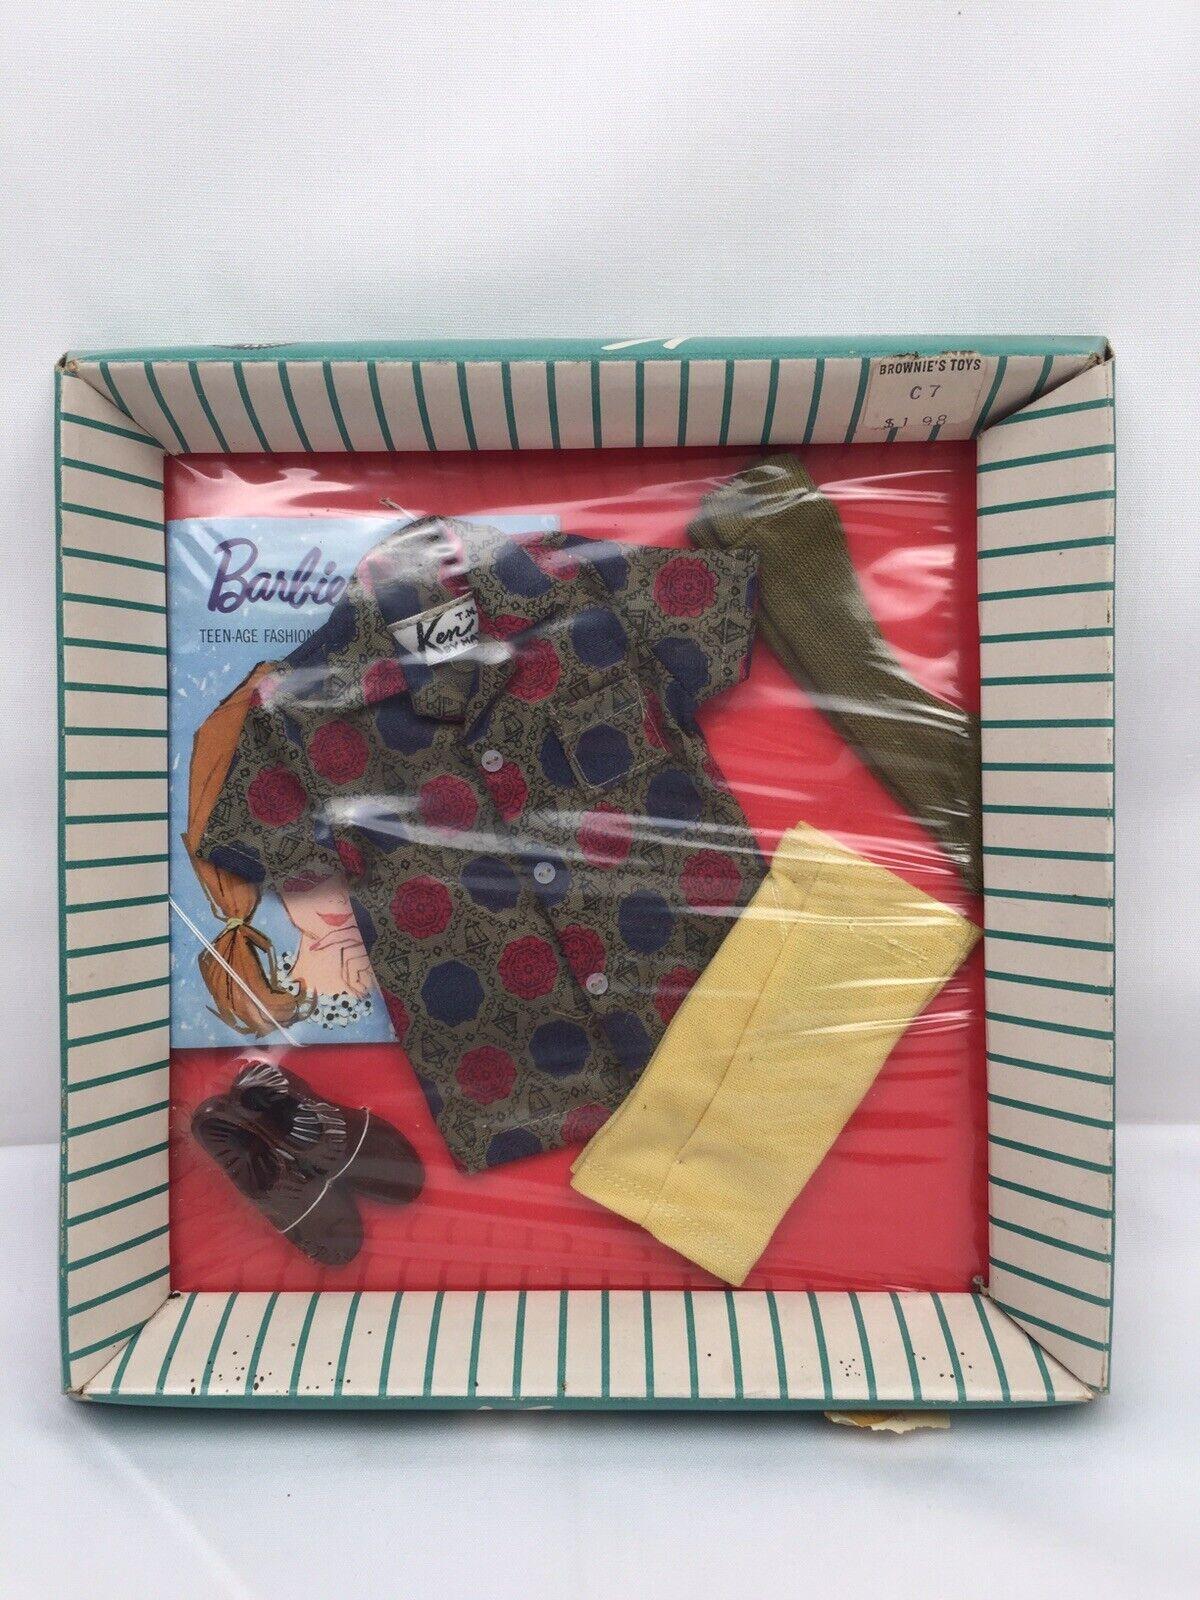 783 Vintage Barbie 1961-63 Ken Doll  SPORT SHORTS  Outfit Set BRAND NEW  RARE